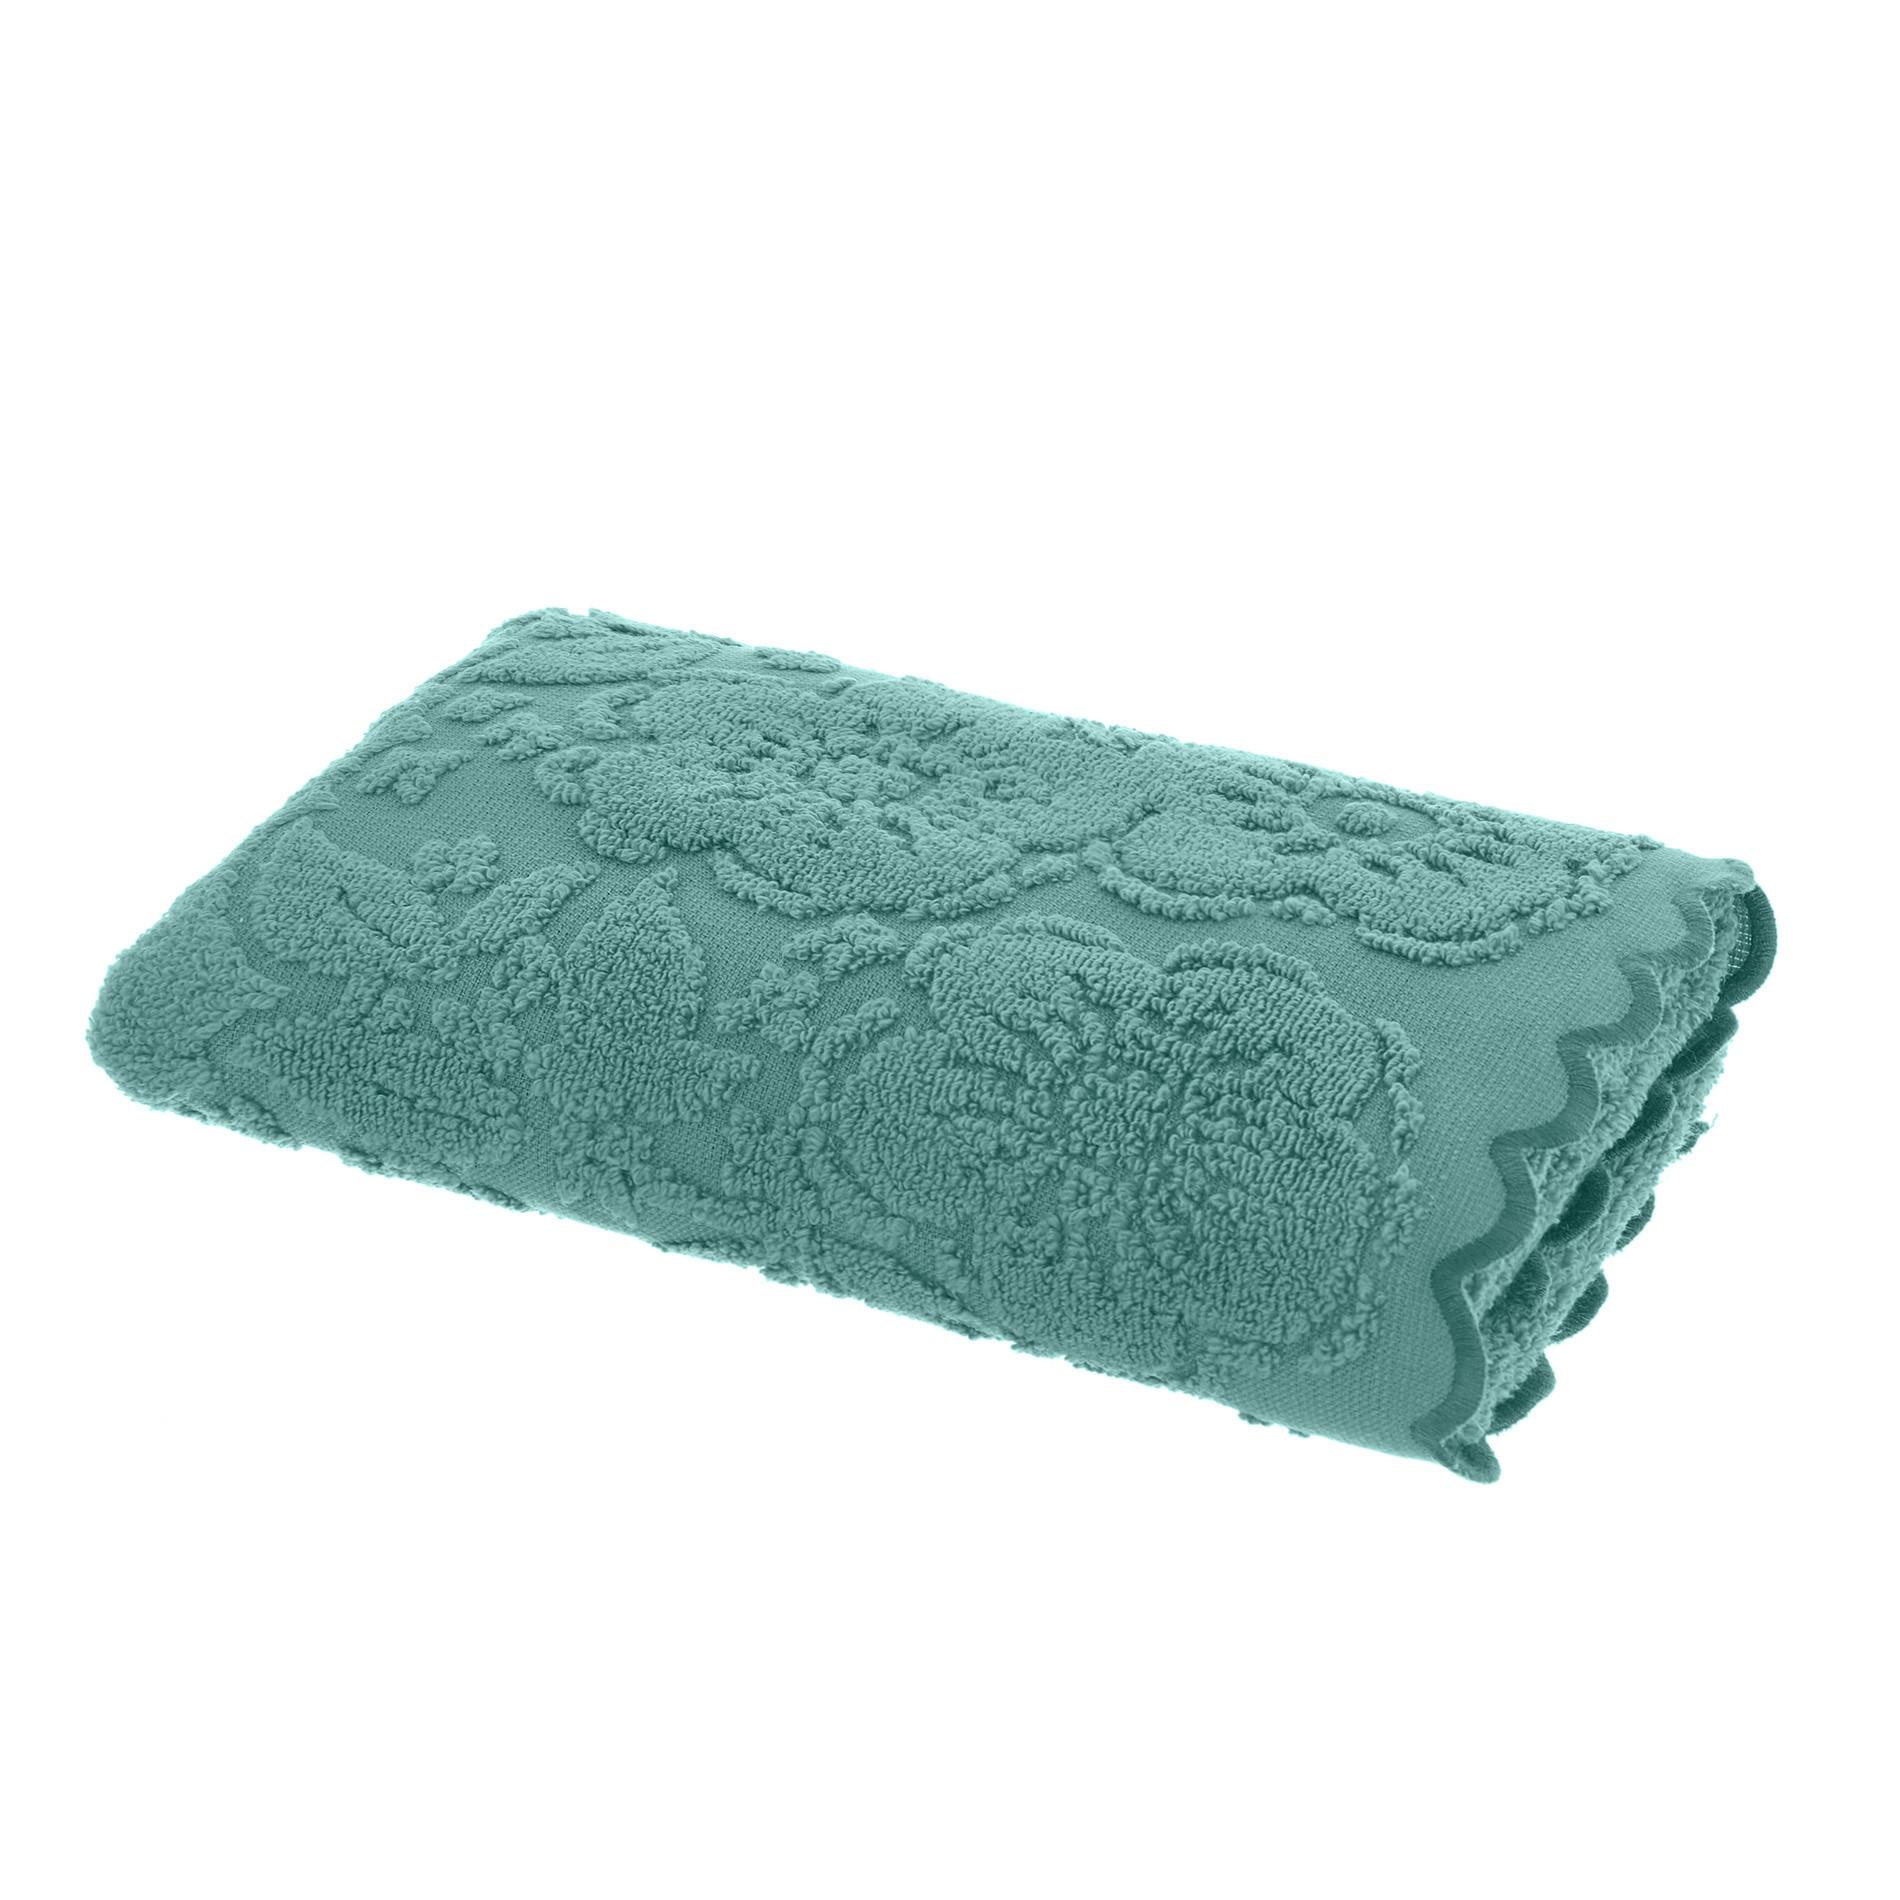 Asciugamano spugna di cotone bordo jacquard, Verde ottanio, large image number 1